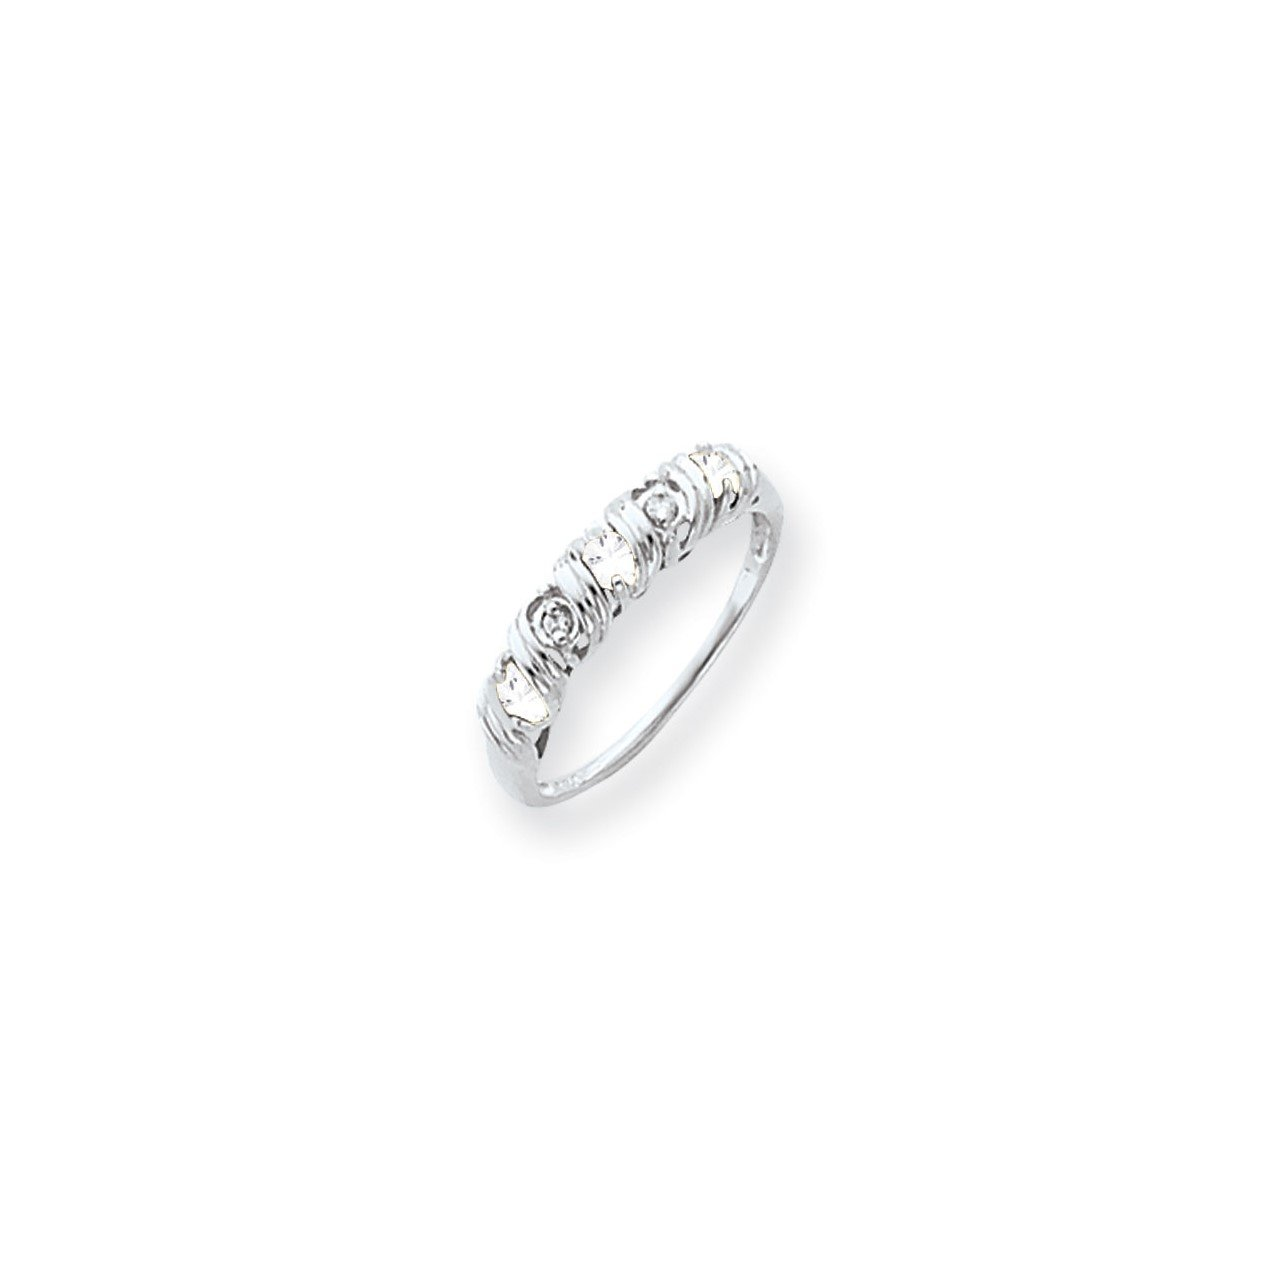 14k White Gold 2.75mm Cubic Zirconia AAA Diamond ring